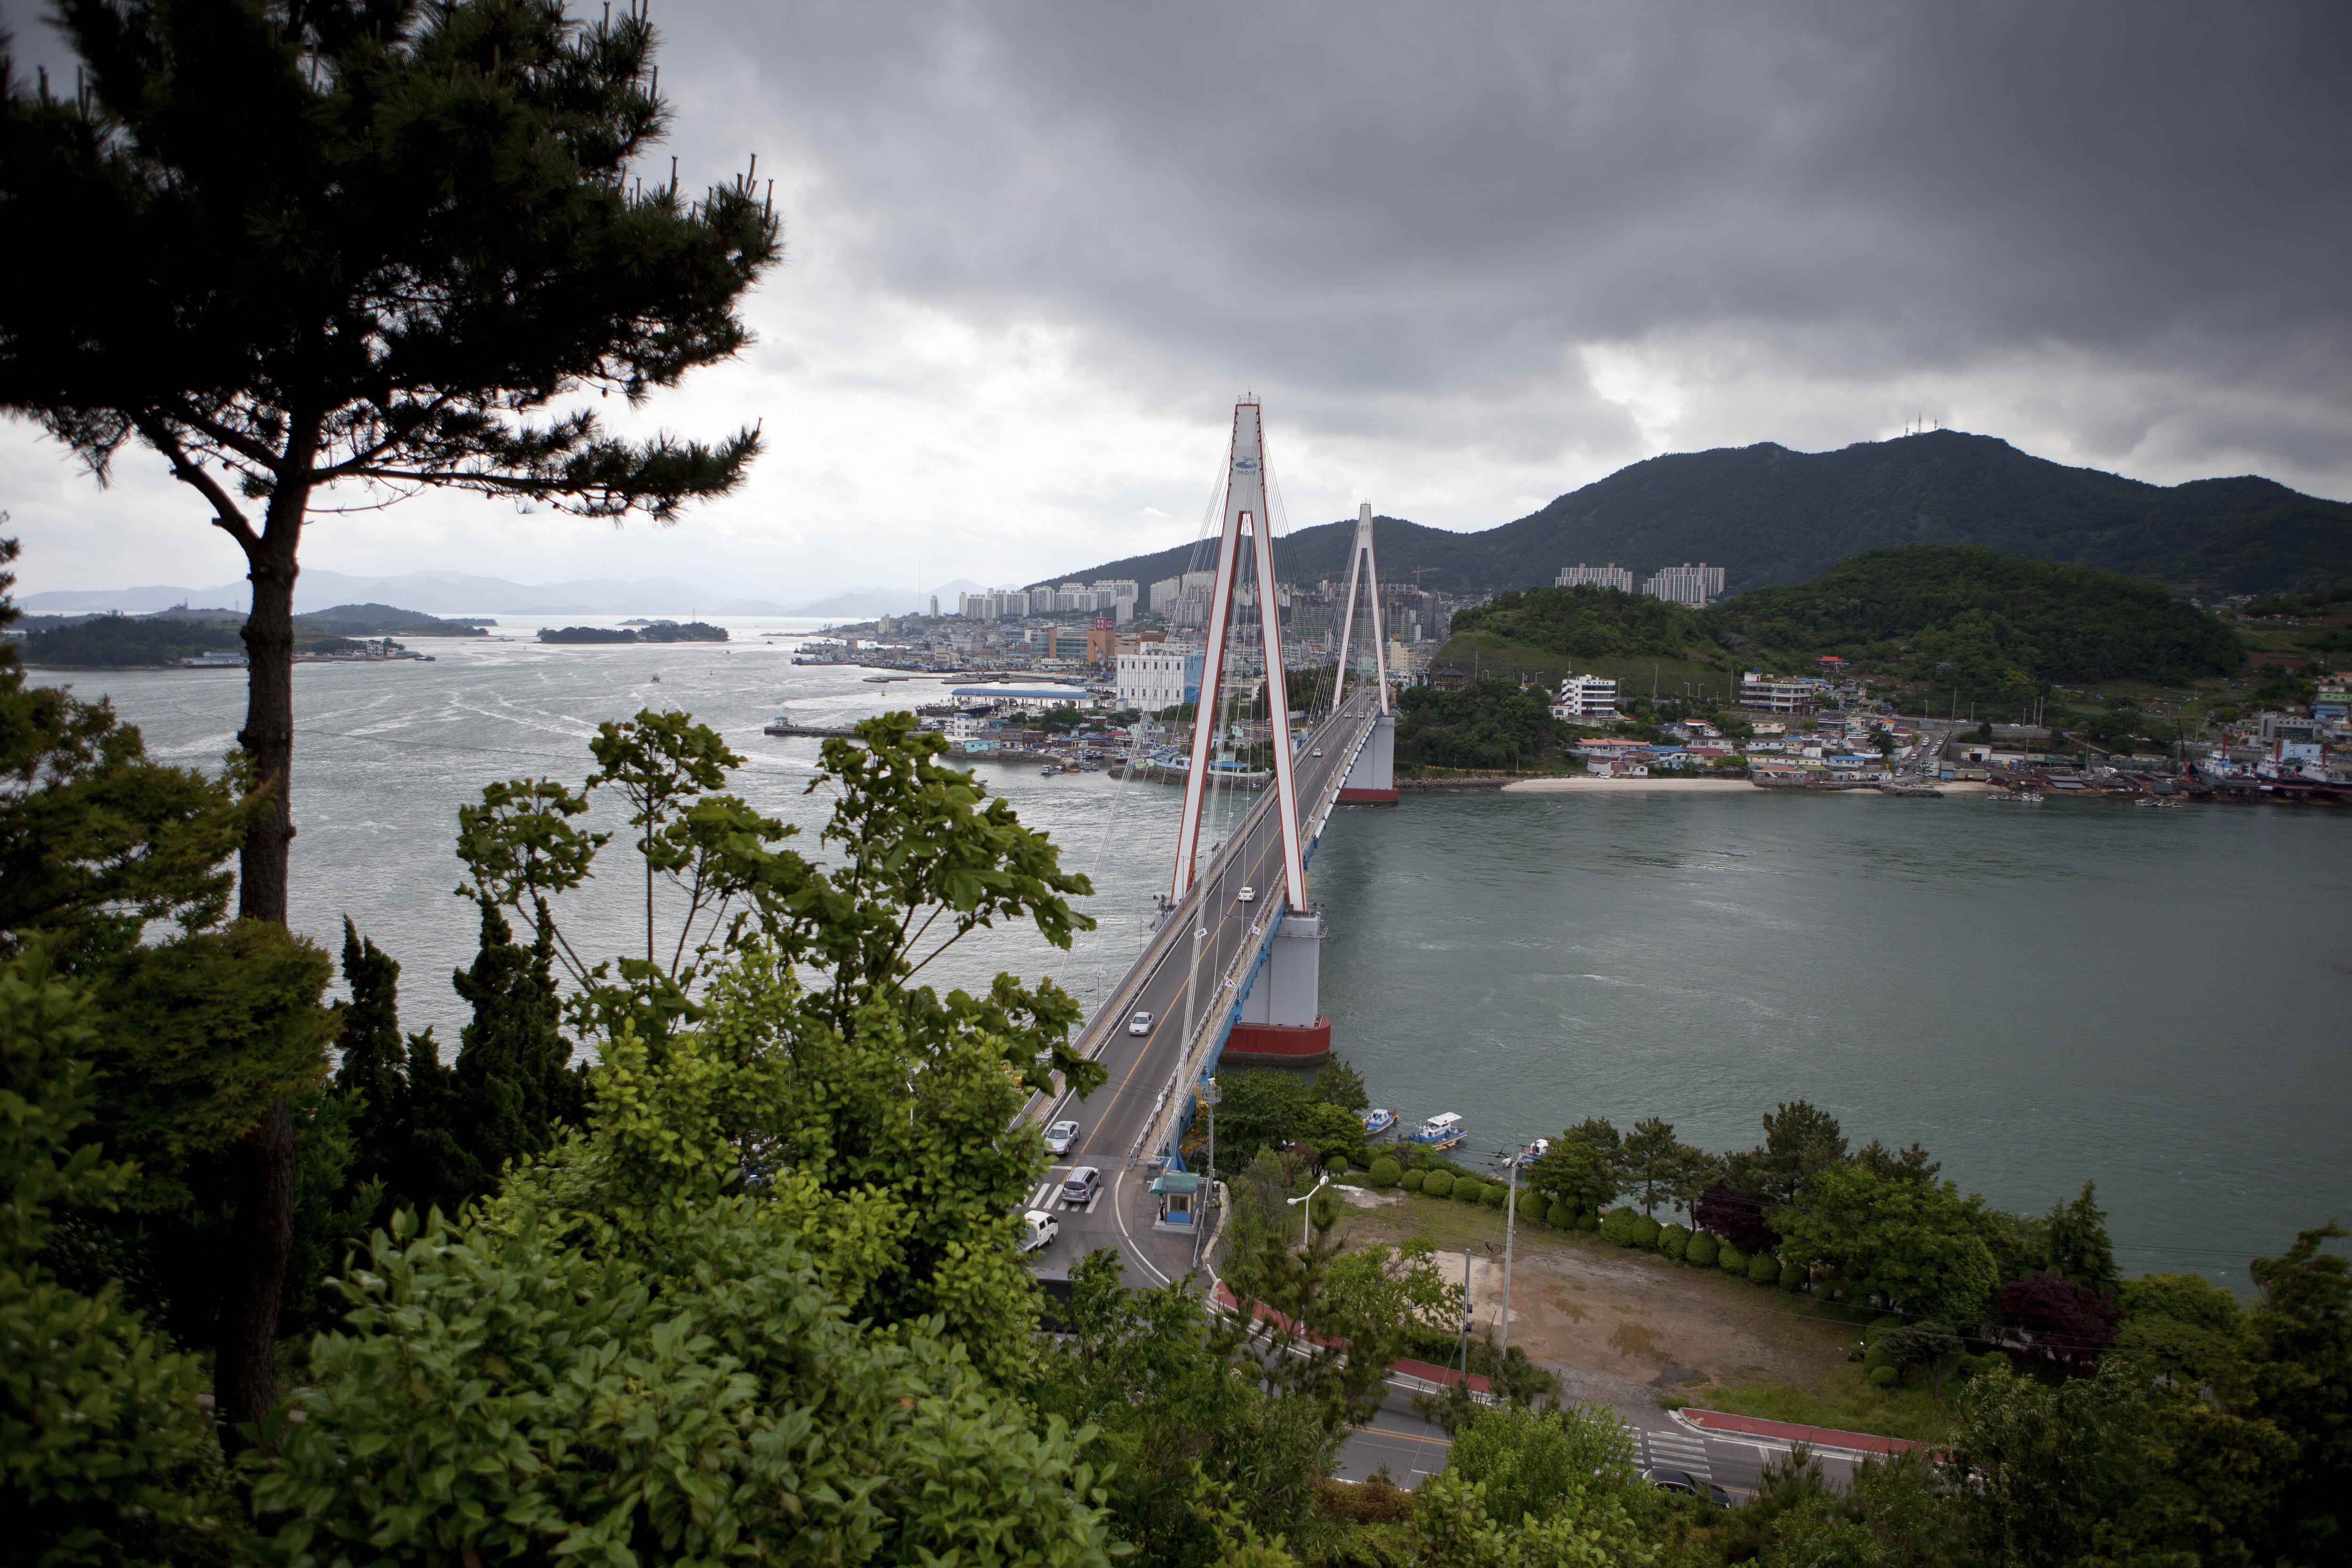 Dolsan Bridge in Yeosu, South Jeolla Province, Republic of Korea